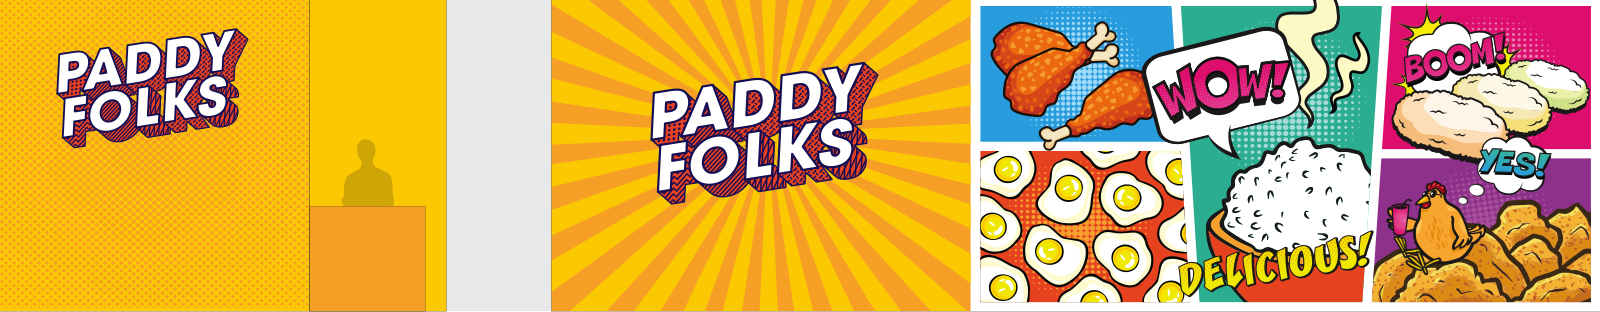 paddyfolks-banner-proposal-2.jpg